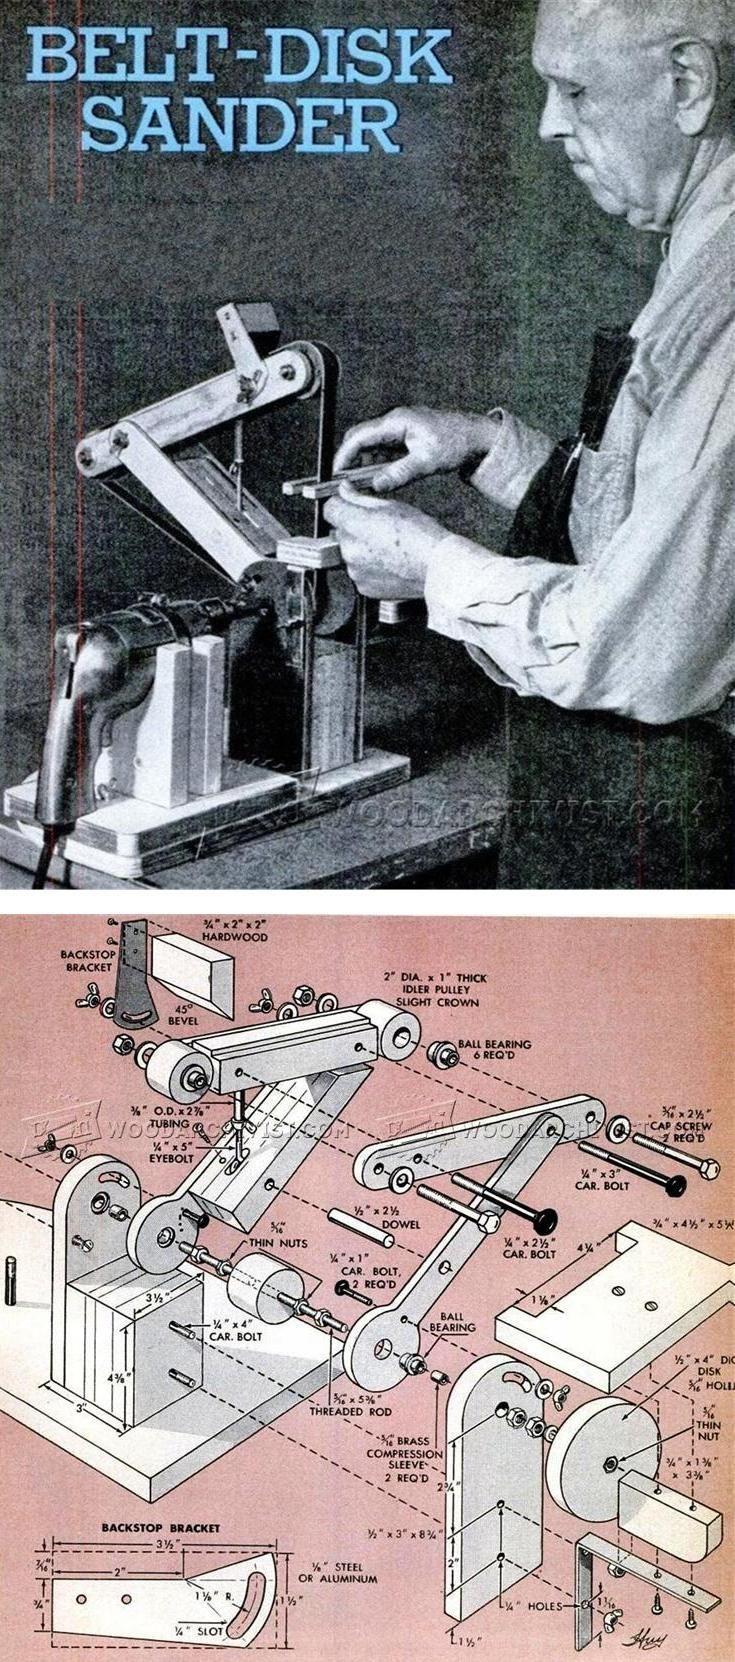 DIY Belt Sander - Sanding Tips, Jigs and Techniques | WoodArchivist.com